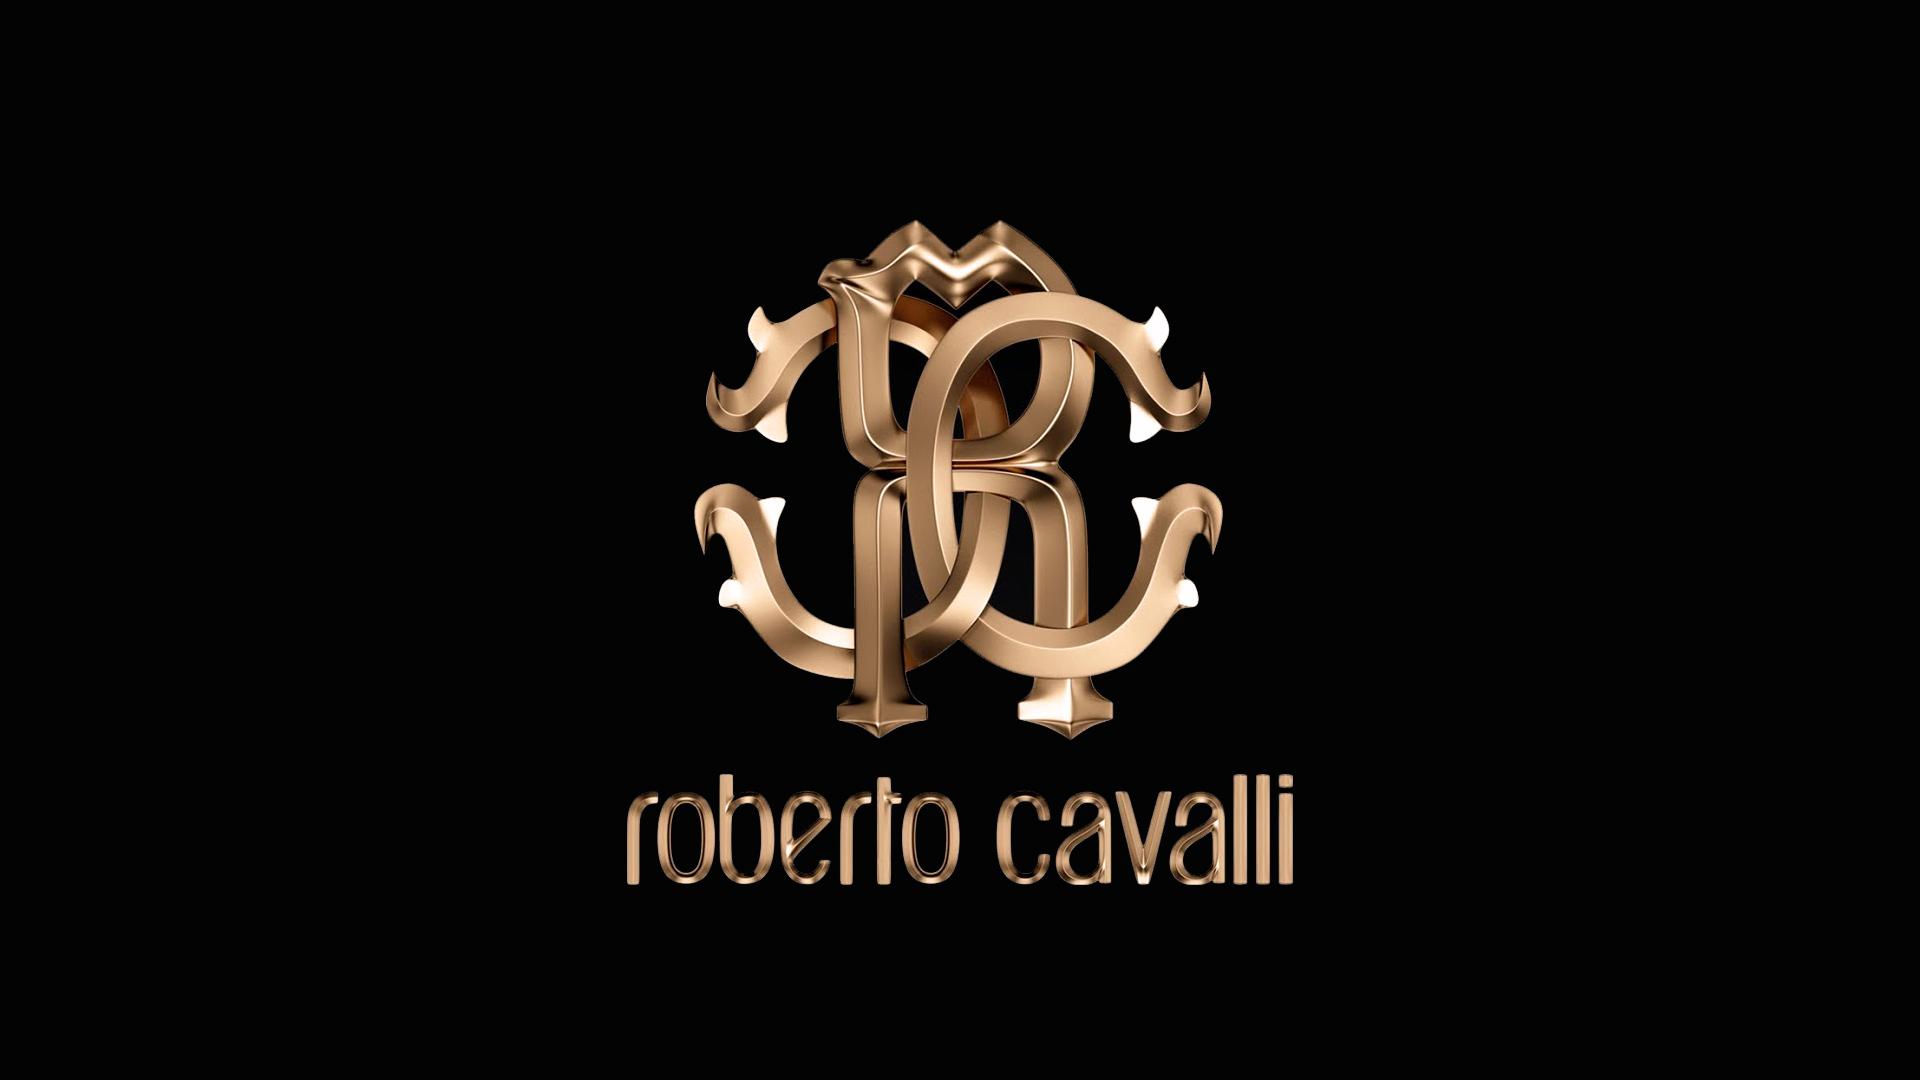 Group Of Beach Girls Wallpaper Luxury Roberto Cavalli Brand Gold Logo On The Wallpaper